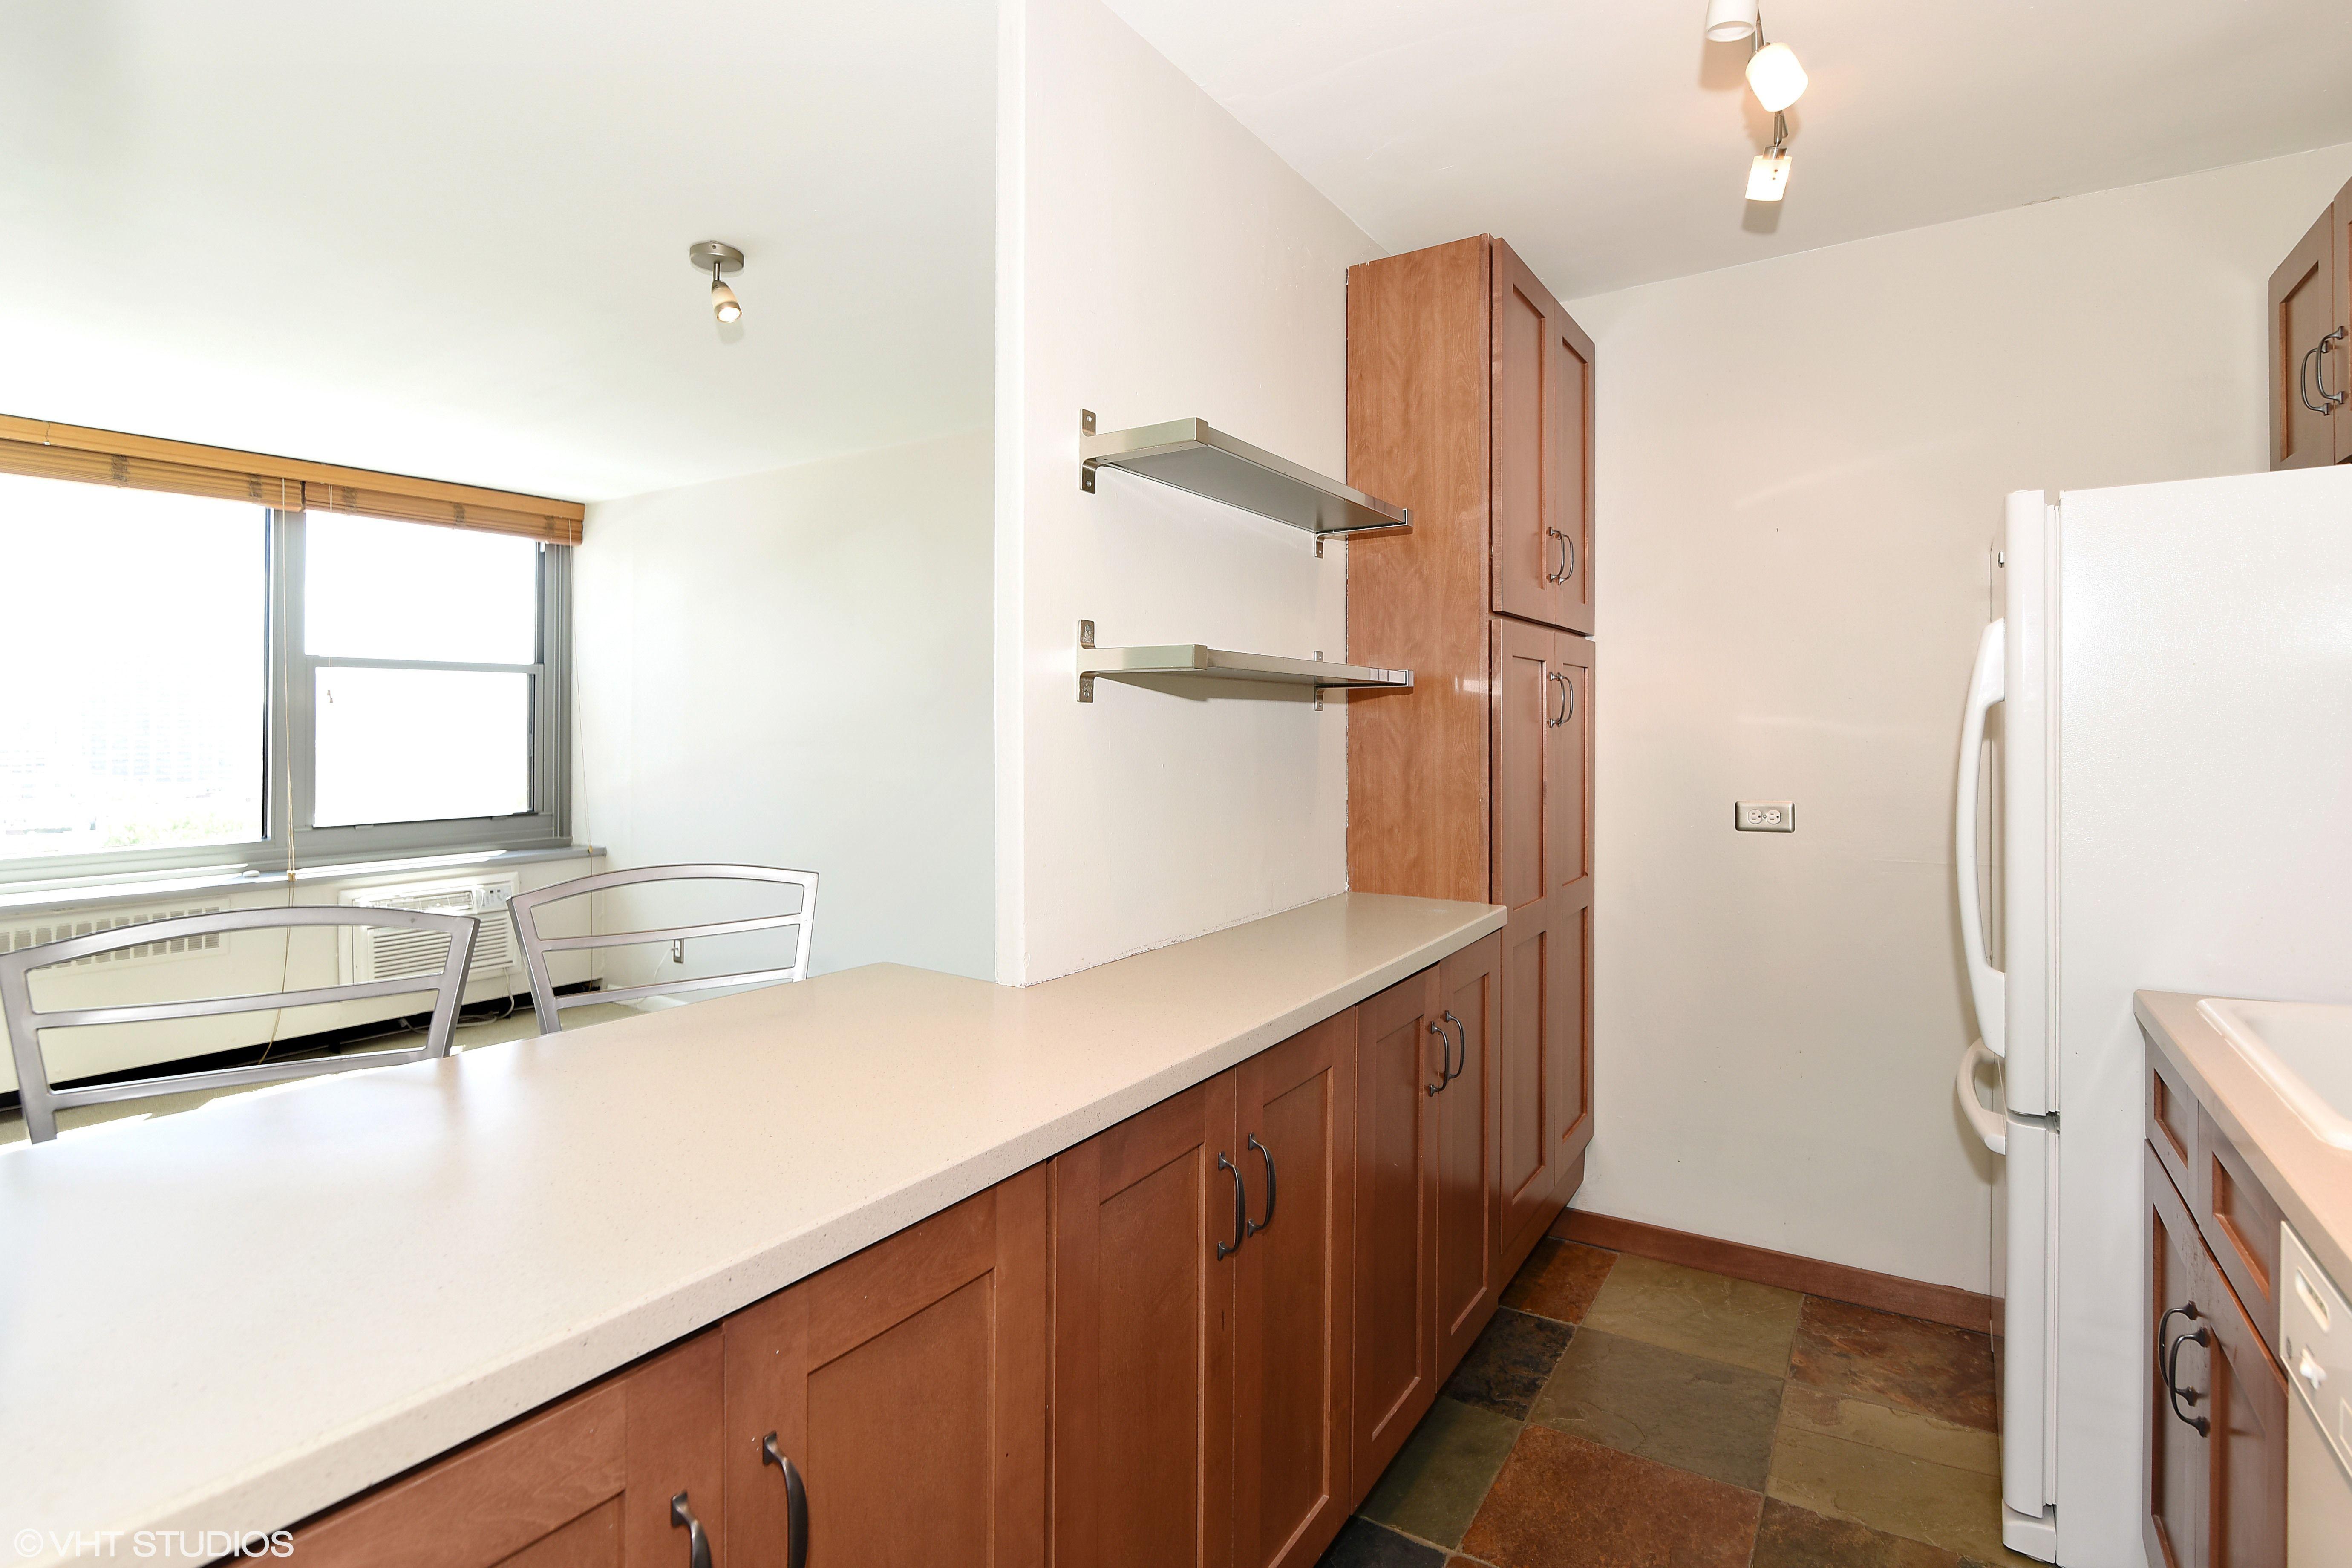 555 W Cornelia Ave #1205 - Kitchen 2